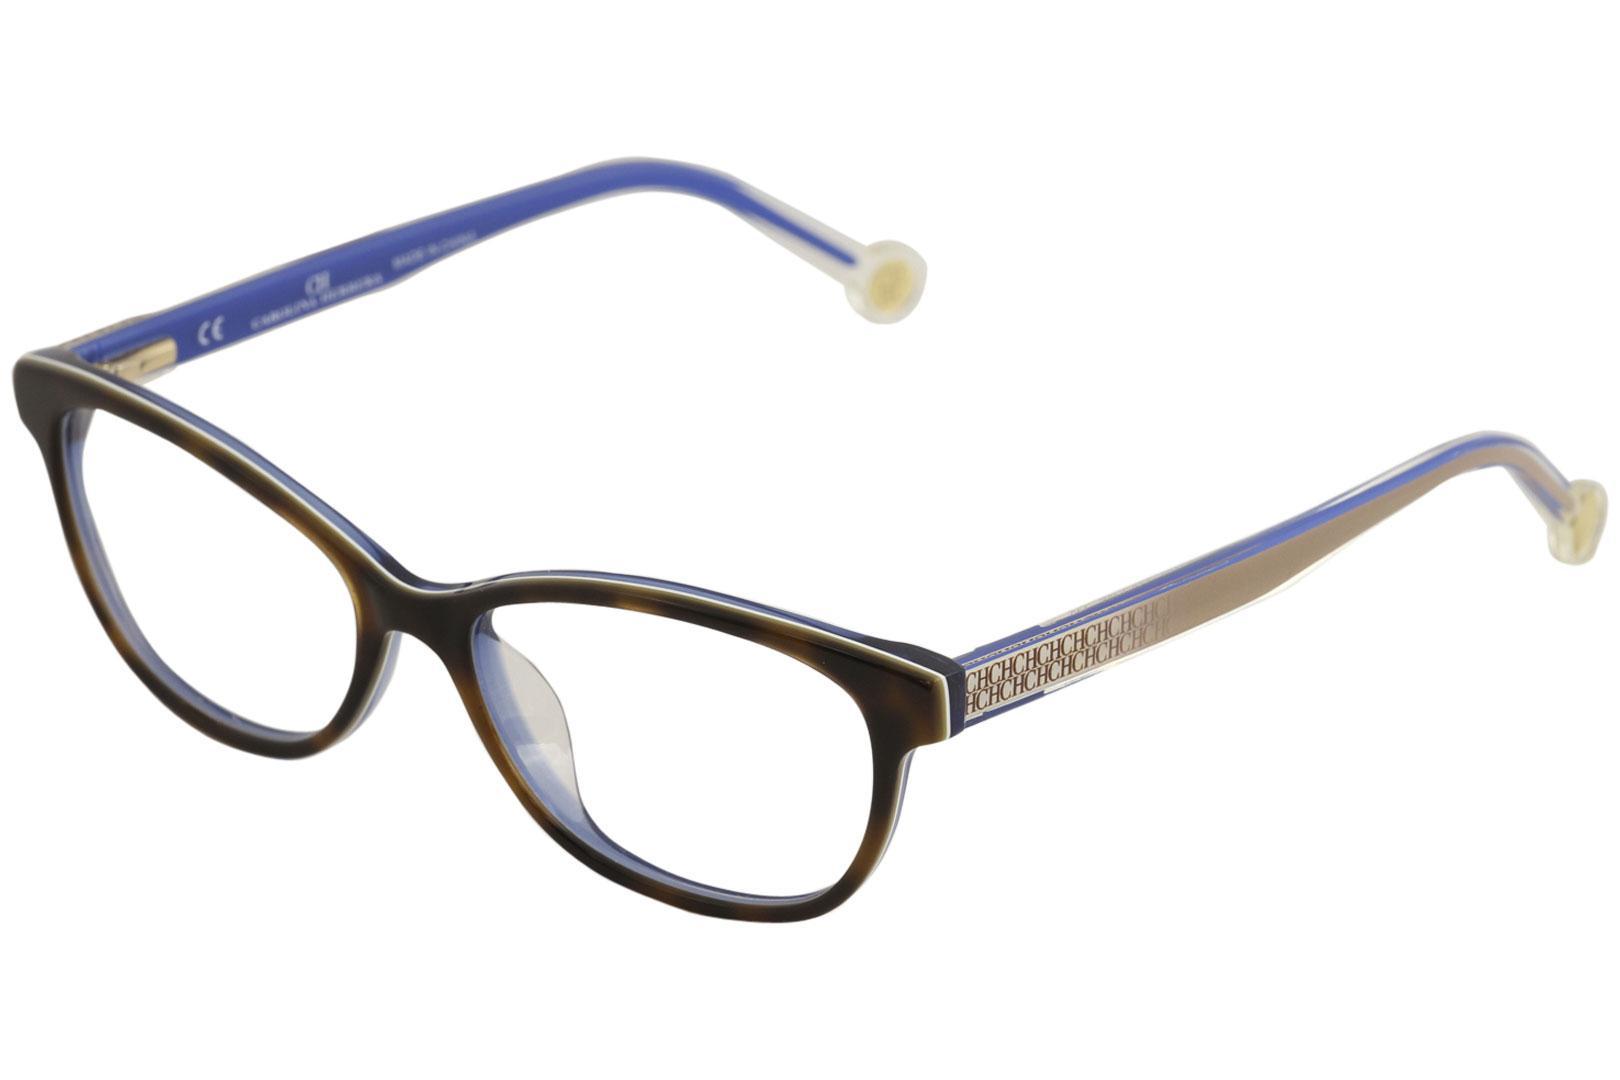 5d5f4bdb1a7 CH Carolina Herrera Women s Eyeglasses VHE726K VHE 726 K Full Rim Optical  Frame